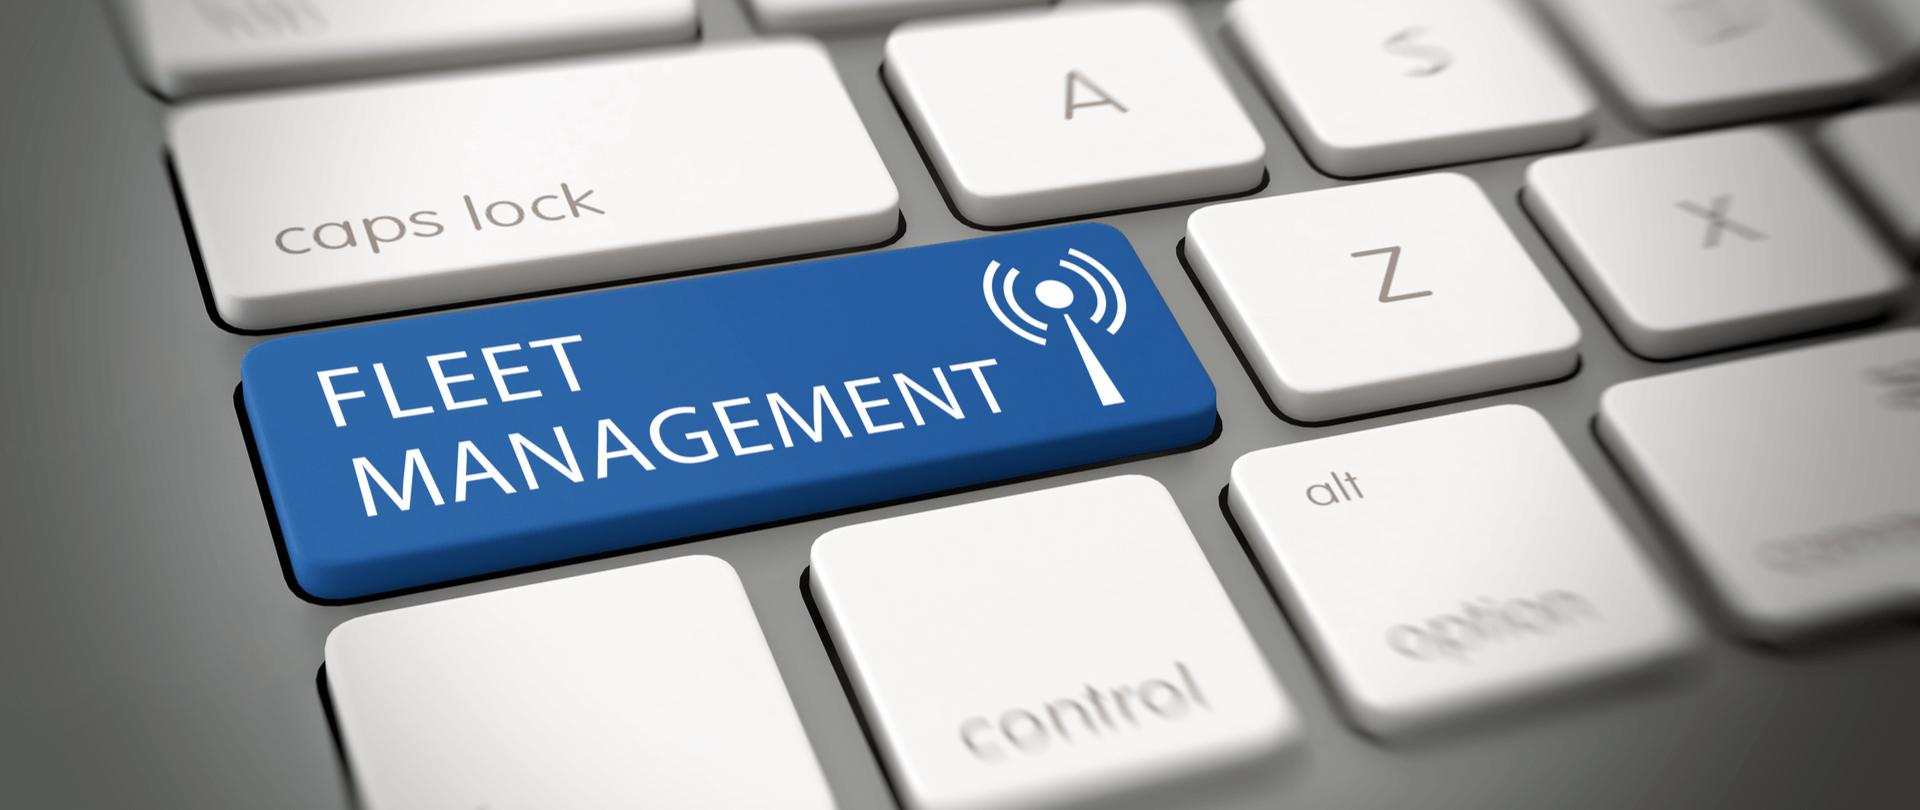 an introduction to fleet management